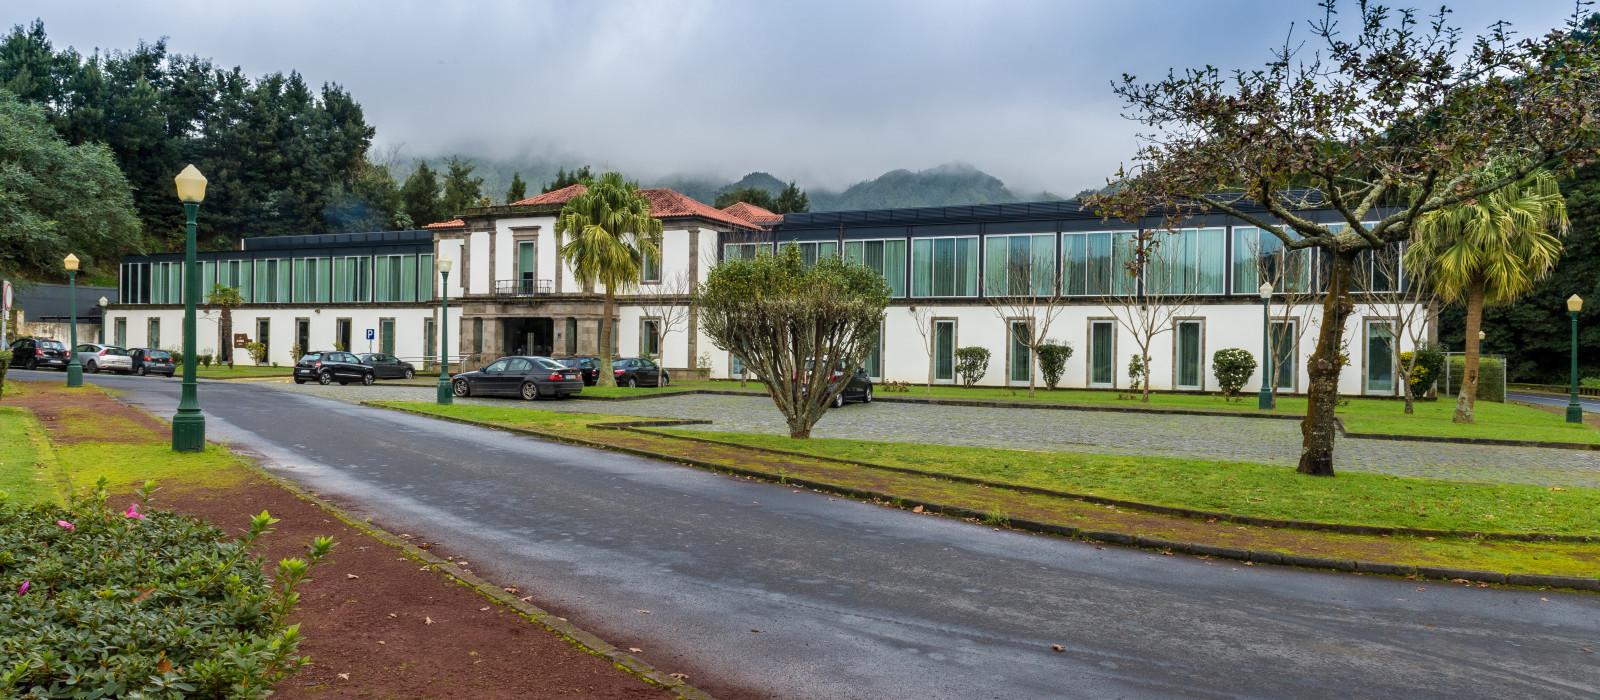 Hotel Furnas Boutique  Portugal